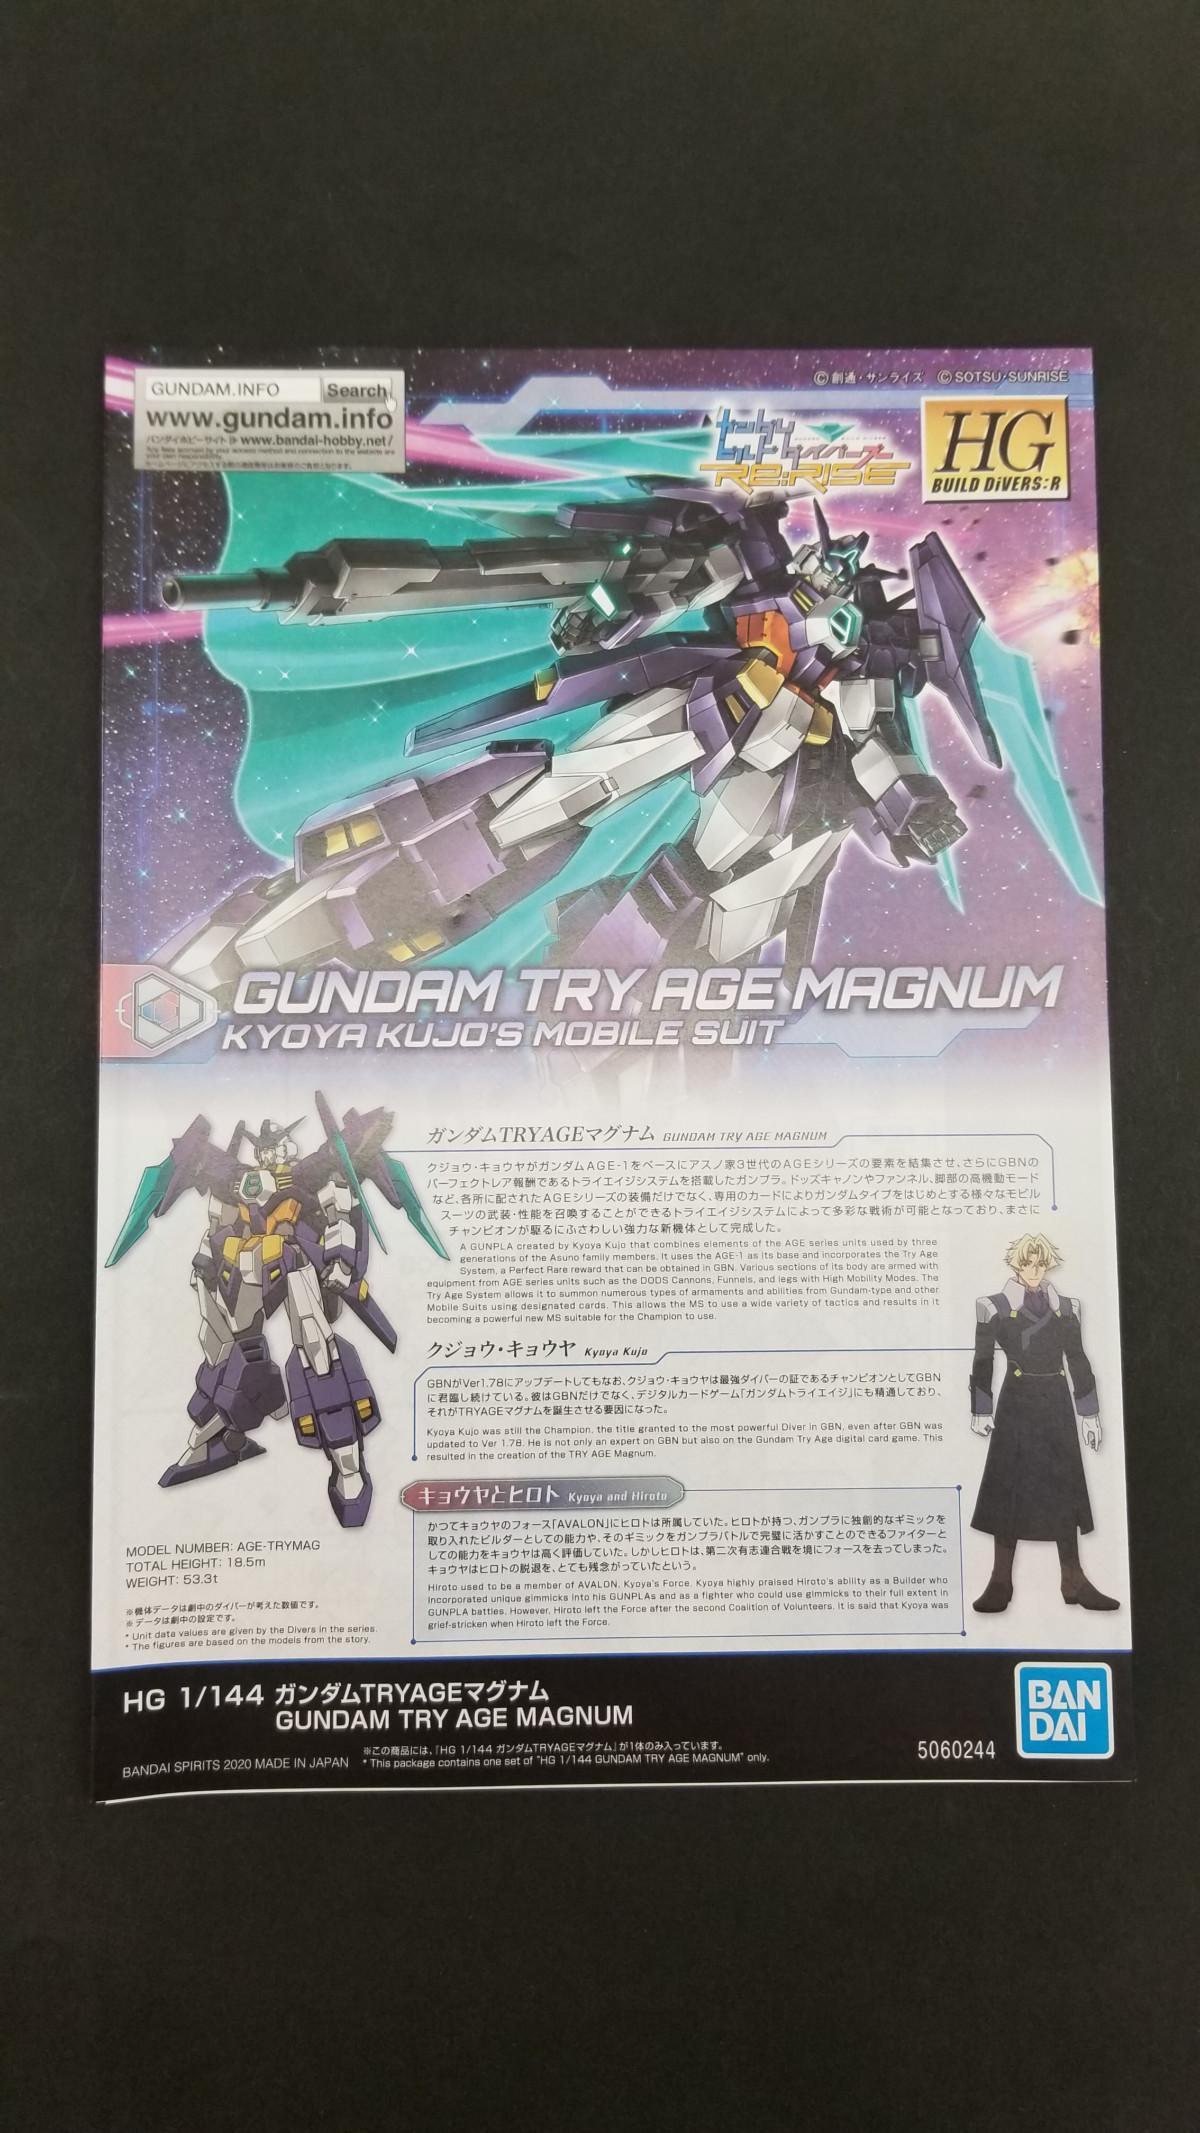 1/144 HGBD:R Gundam TRYAGE Magnum